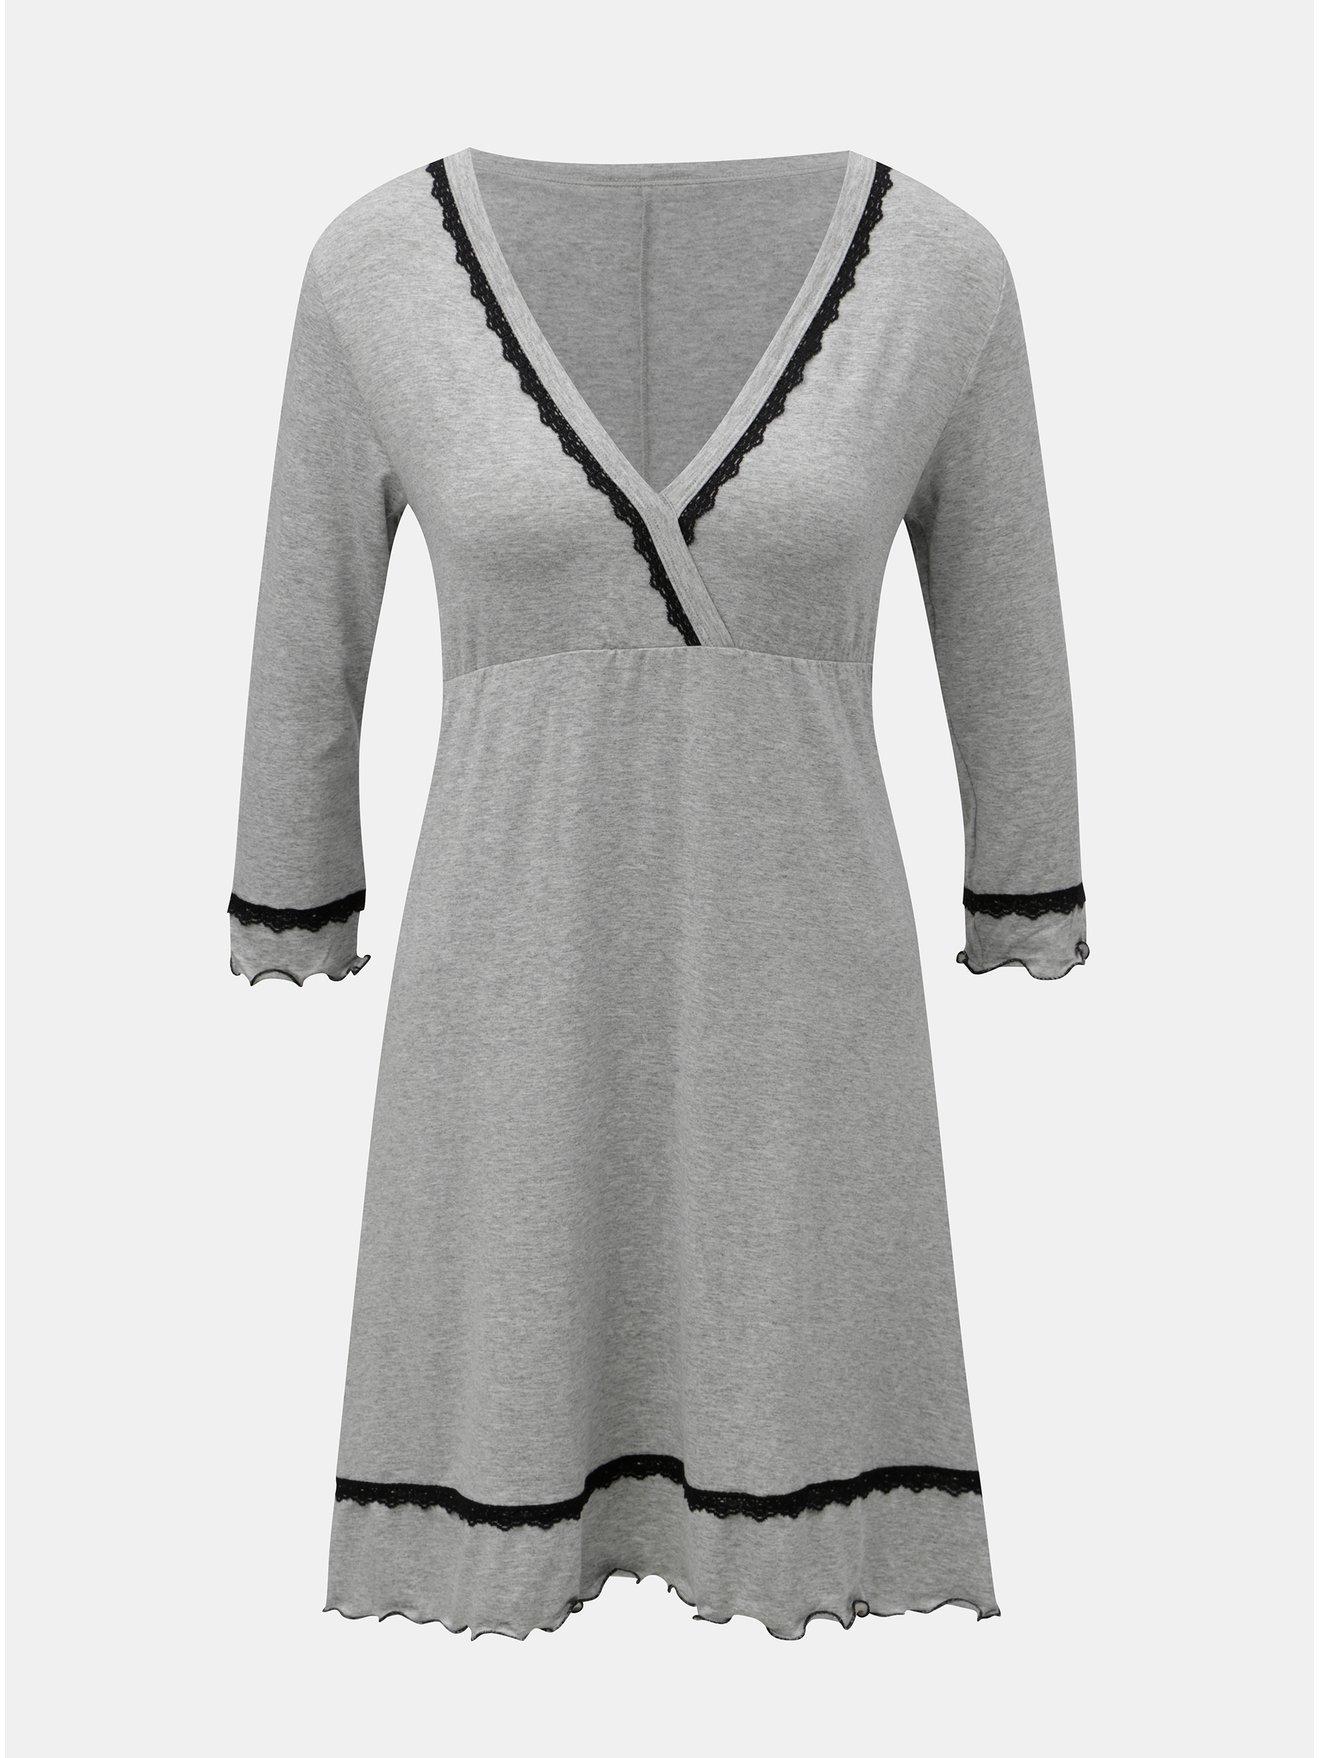 Světle šedá žíhaná košilka s 3/4 rukávem Eldar Lea